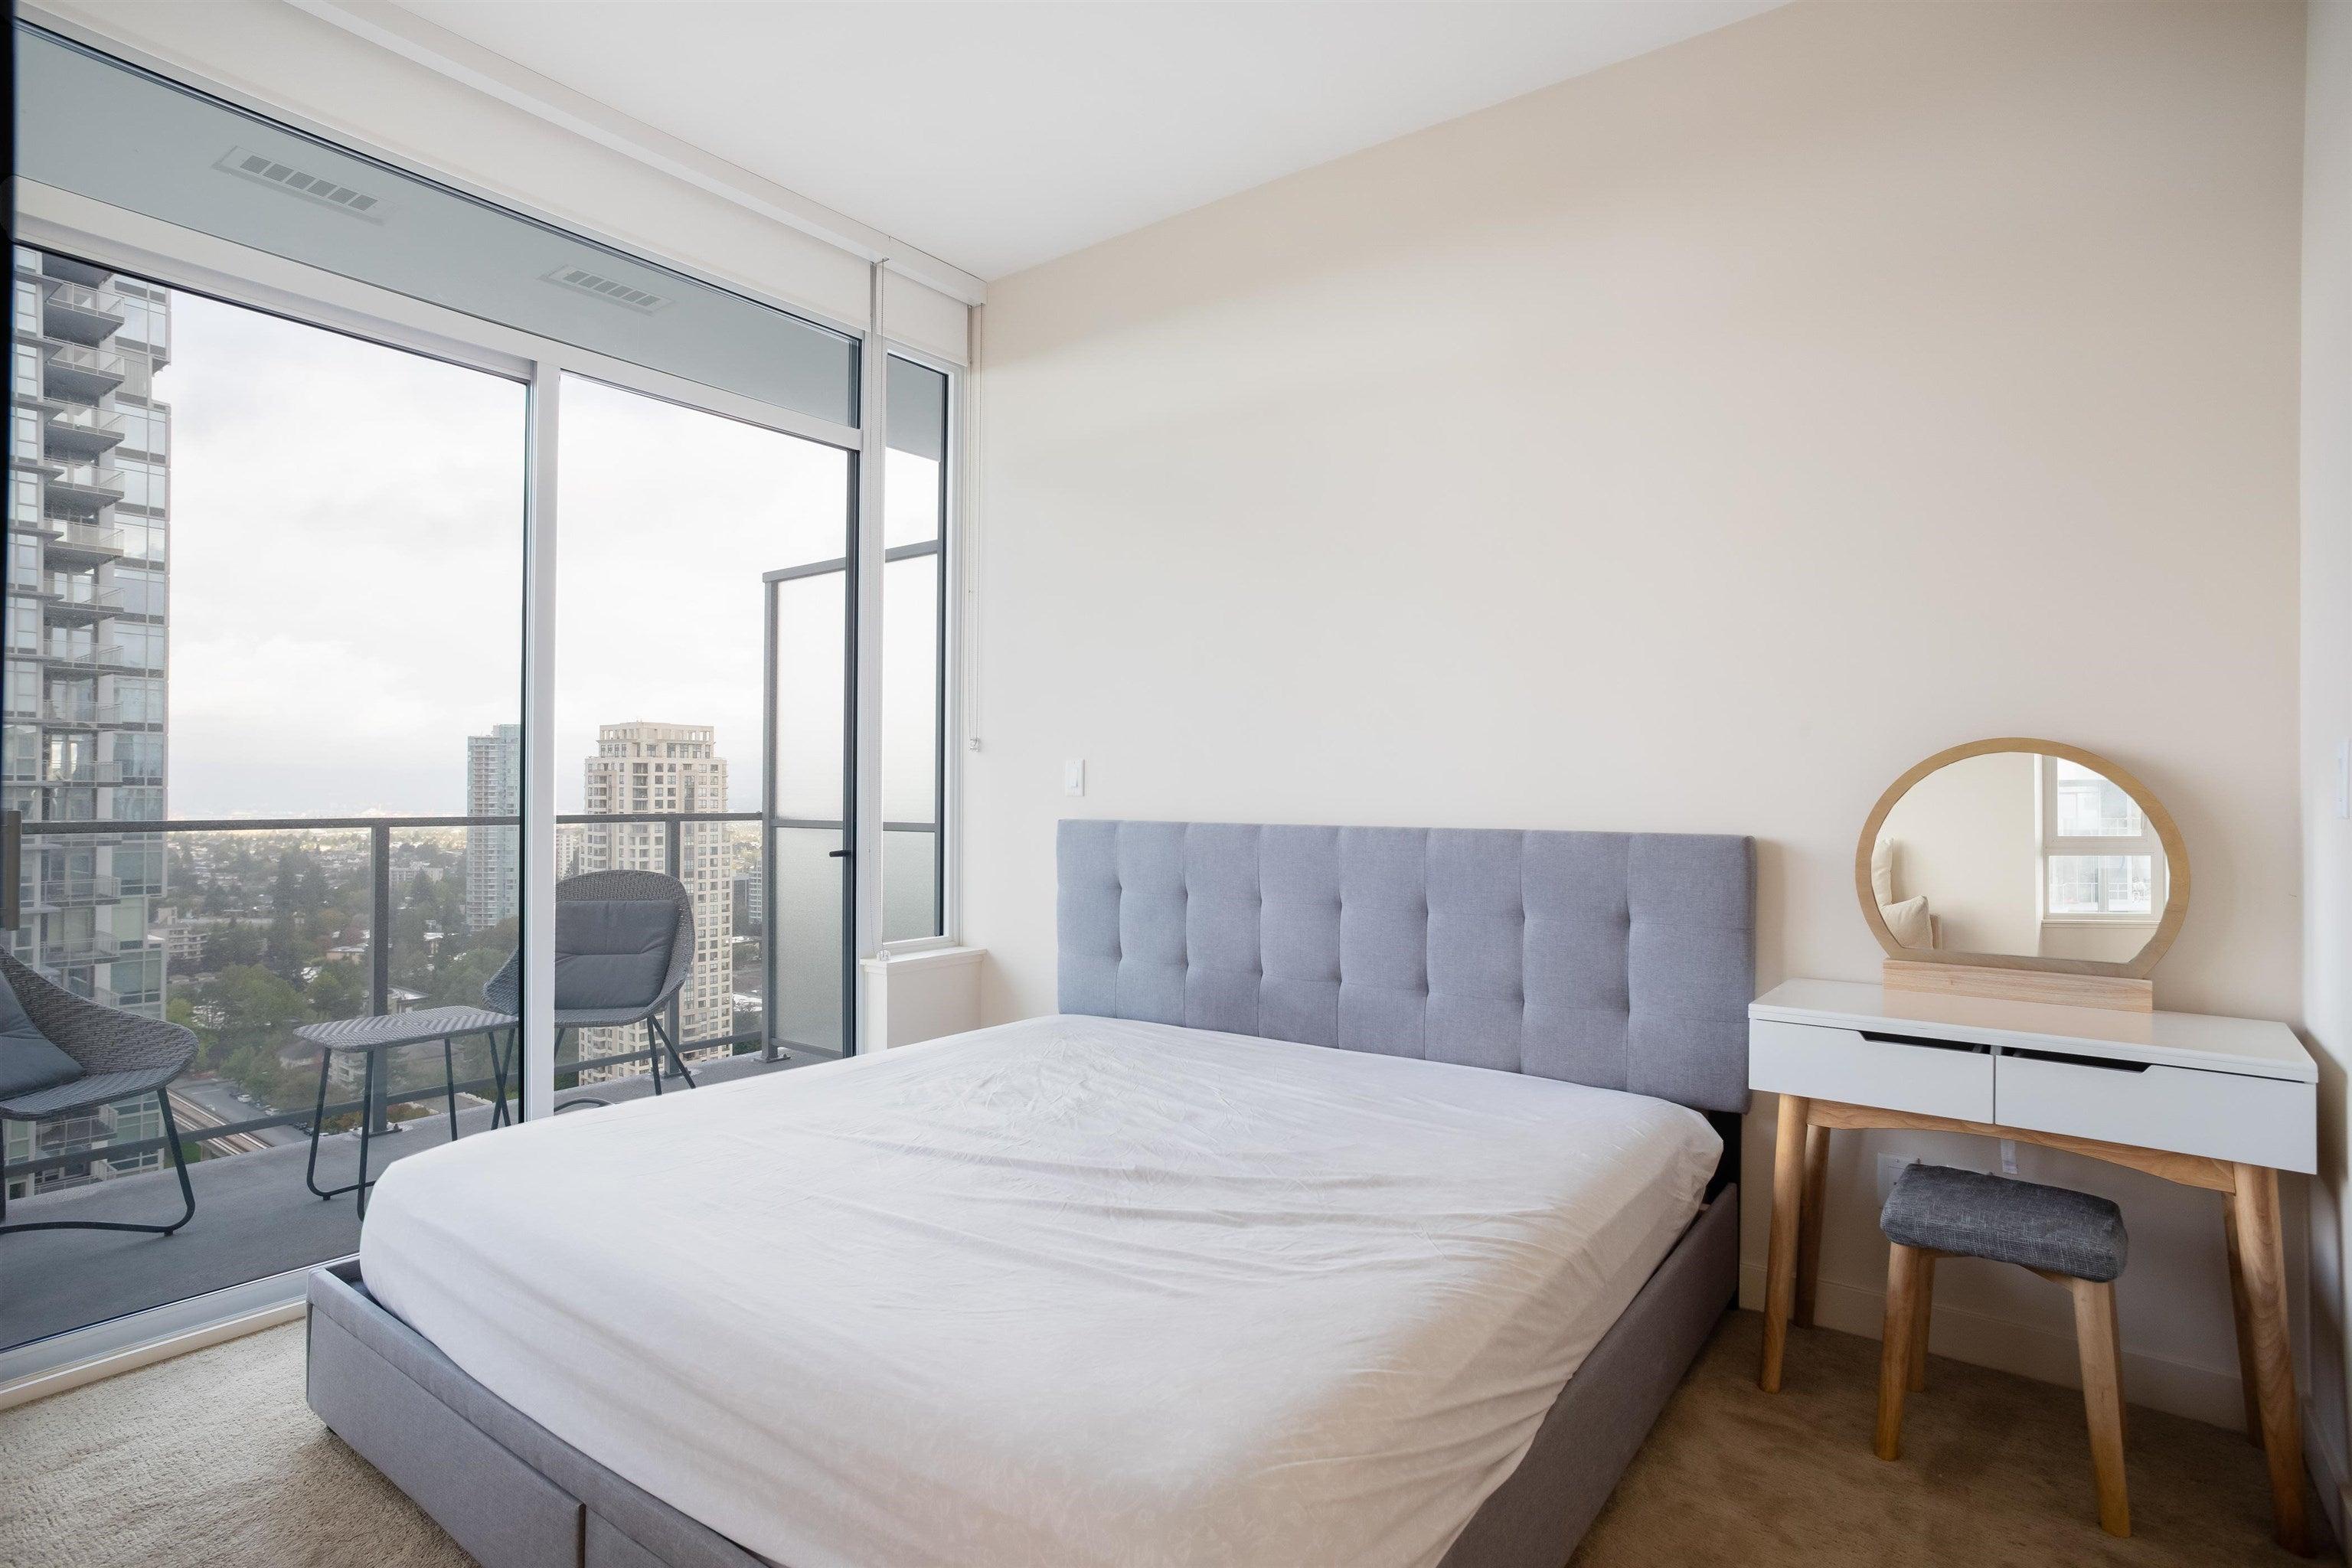 2206 6383 MCKAY AVENUE - Metrotown Apartment/Condo for sale, 2 Bedrooms (R2625647) - #14